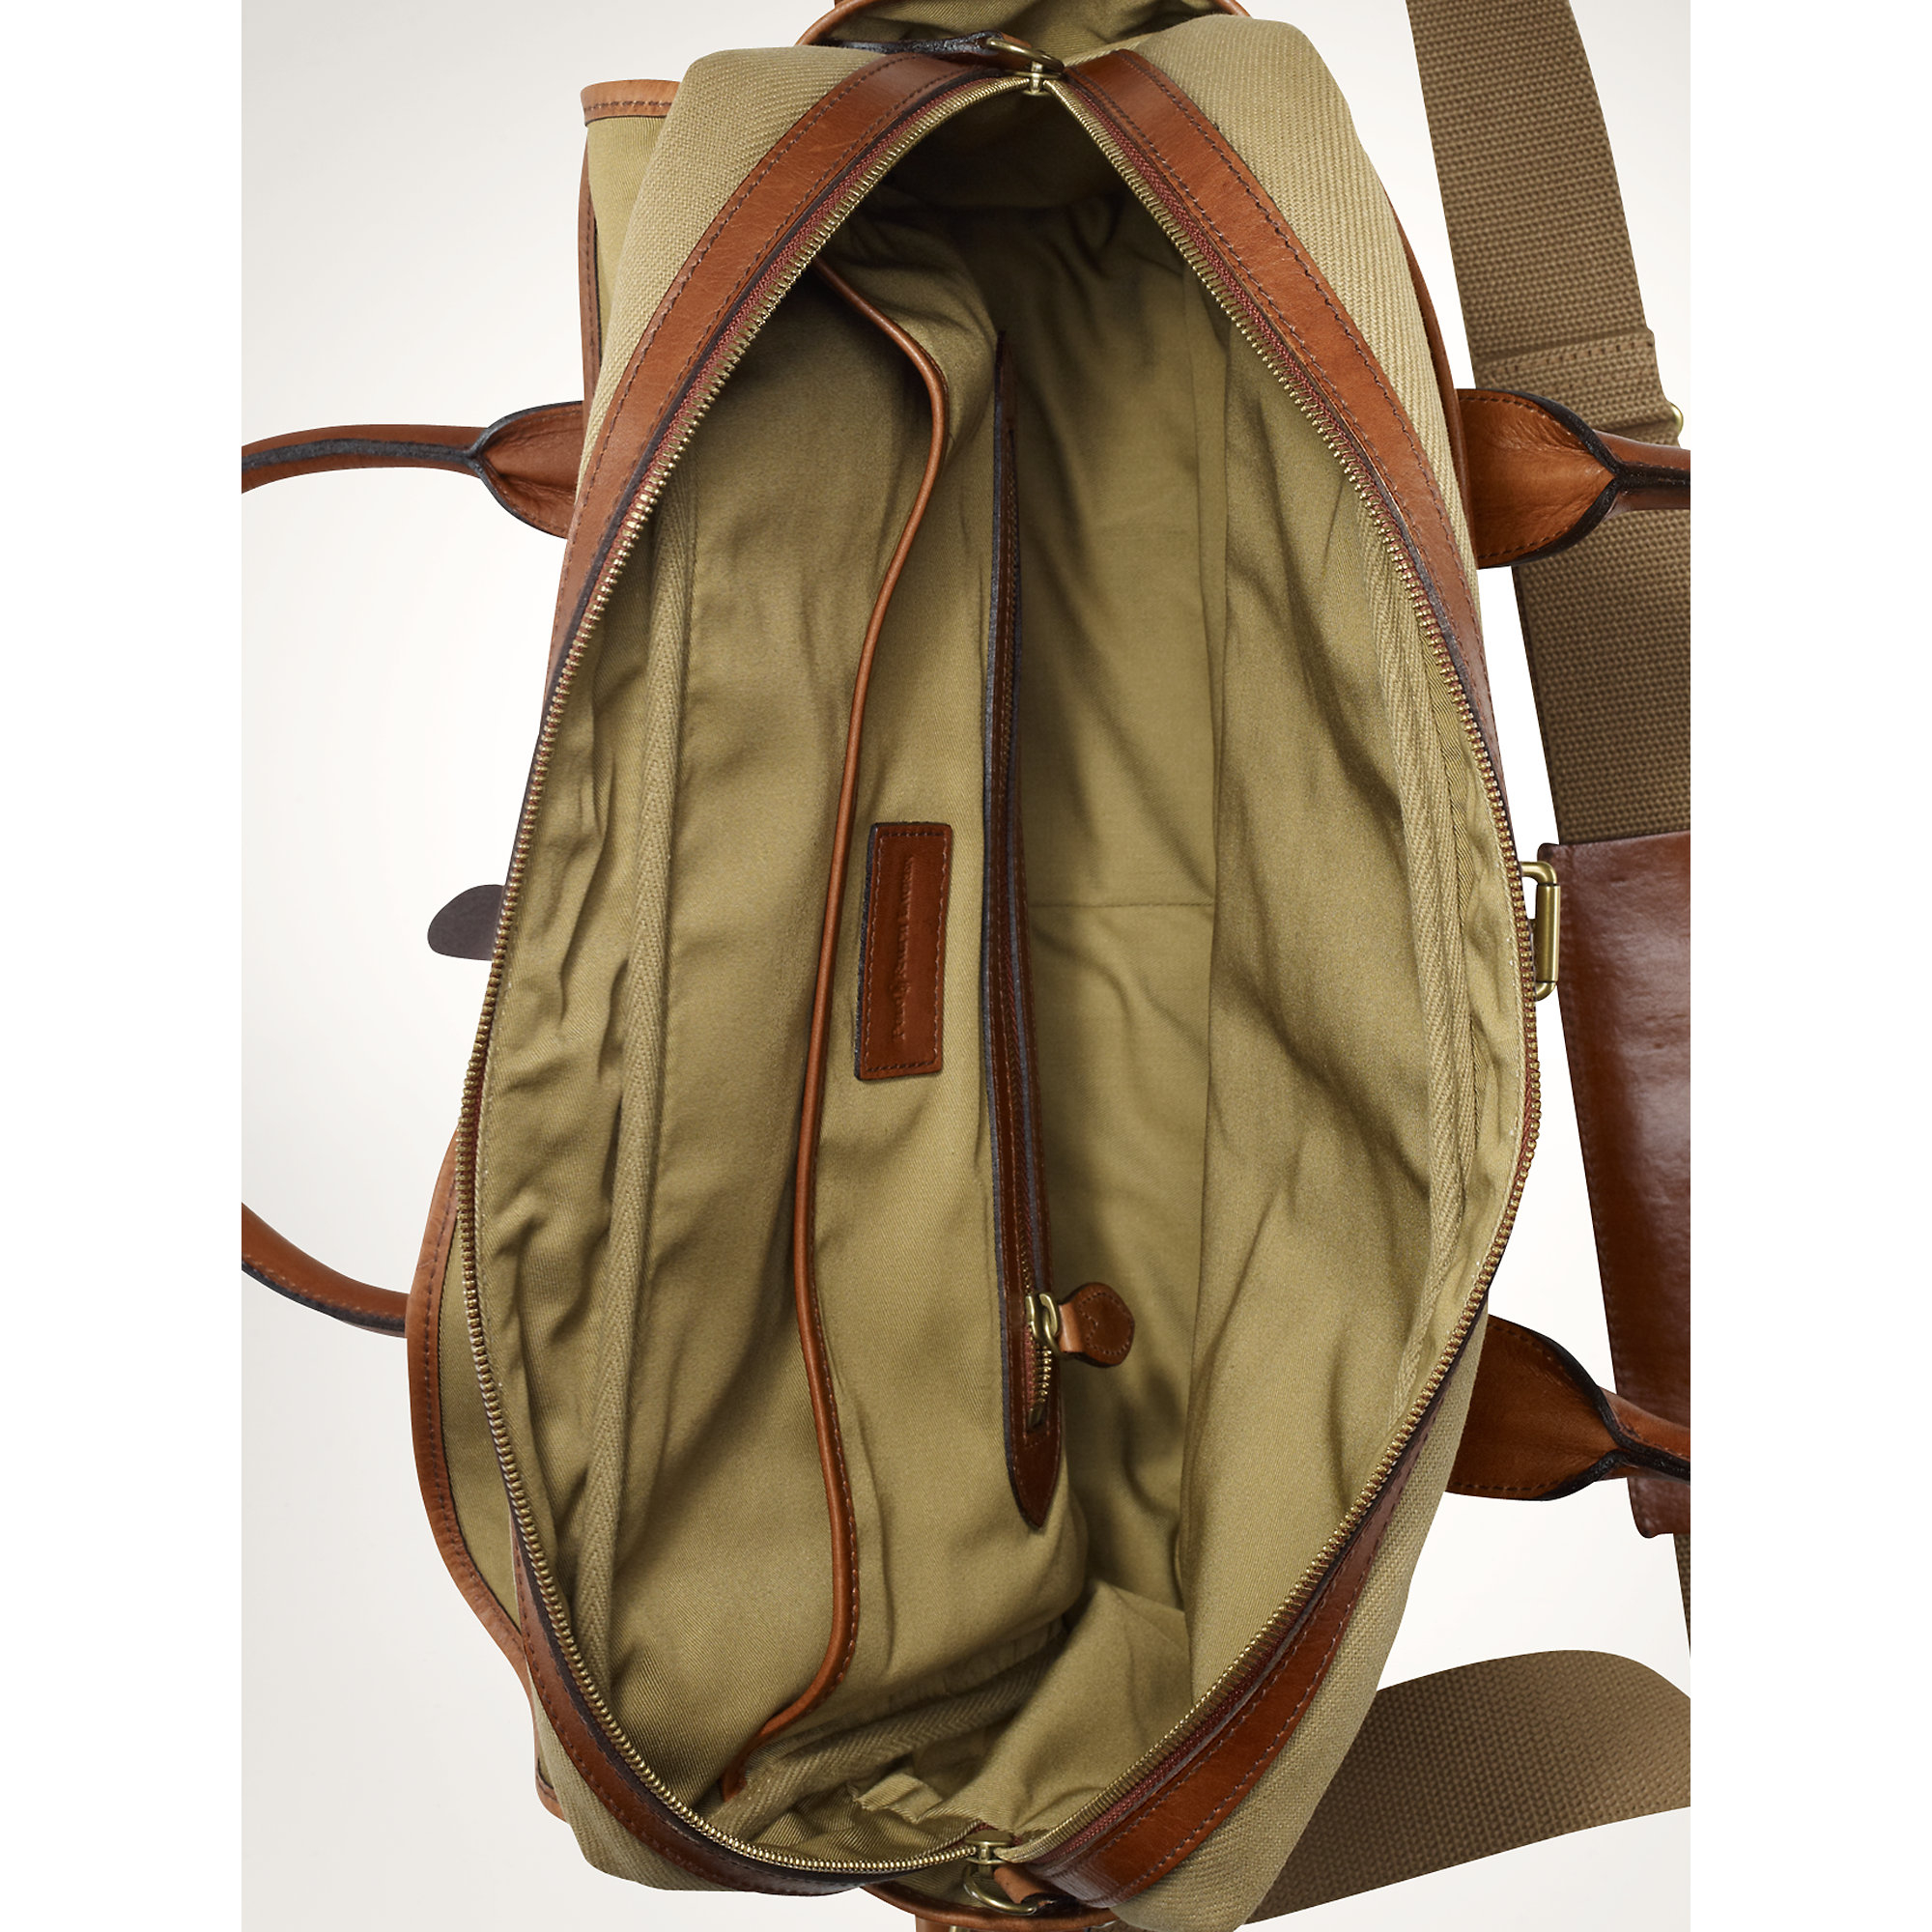 27370f5fe2 discount polo ralph lauren canvas messenger bag 4ed55 a458c